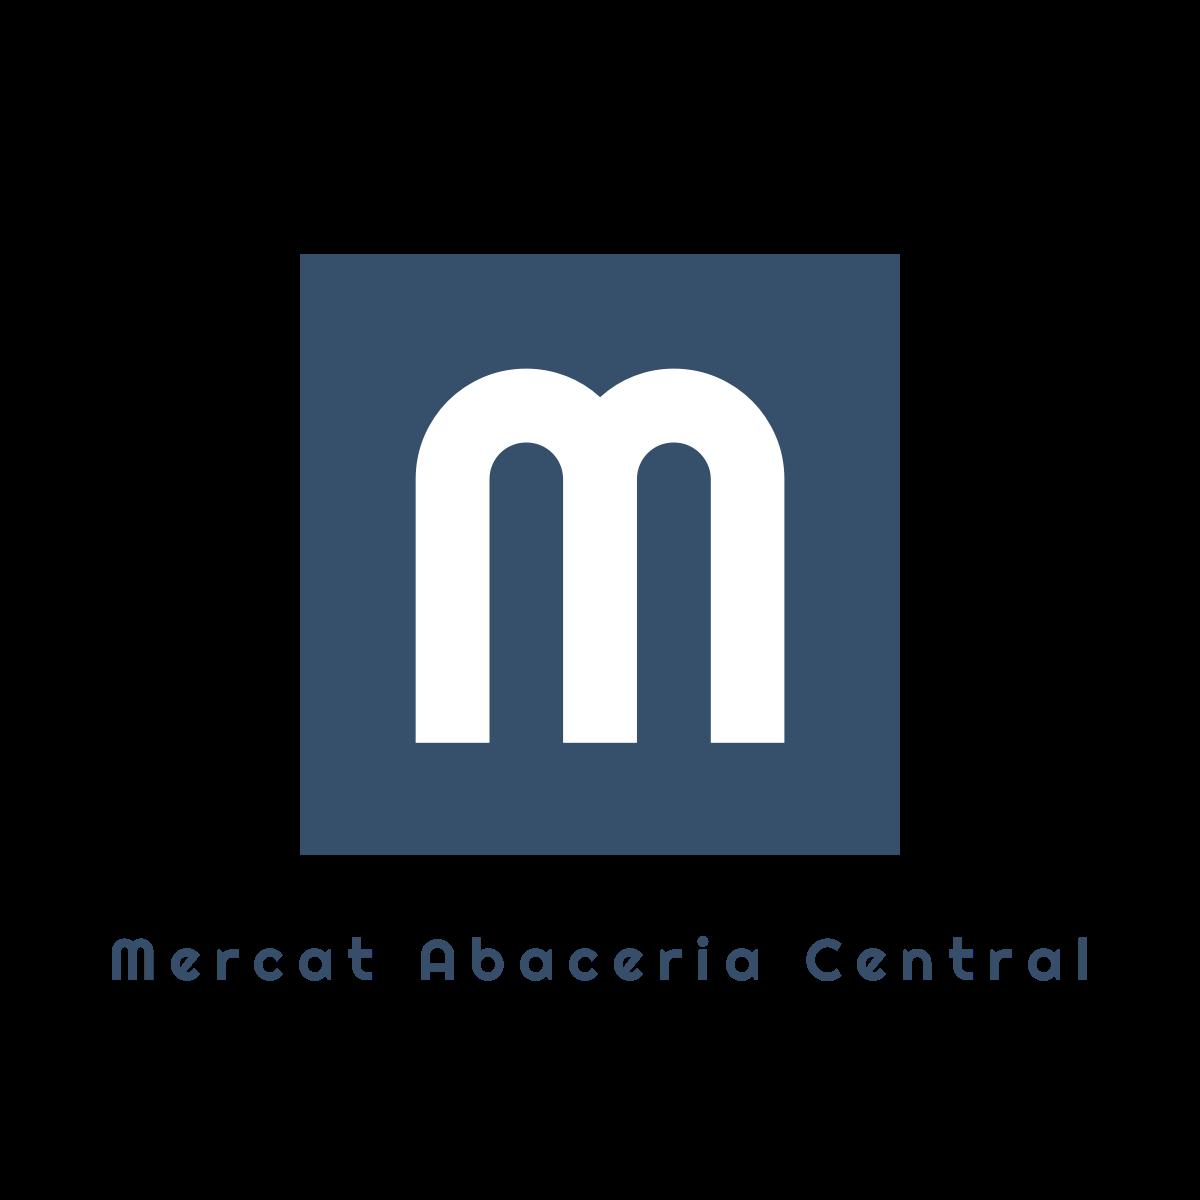 Mercat Abaceria Central